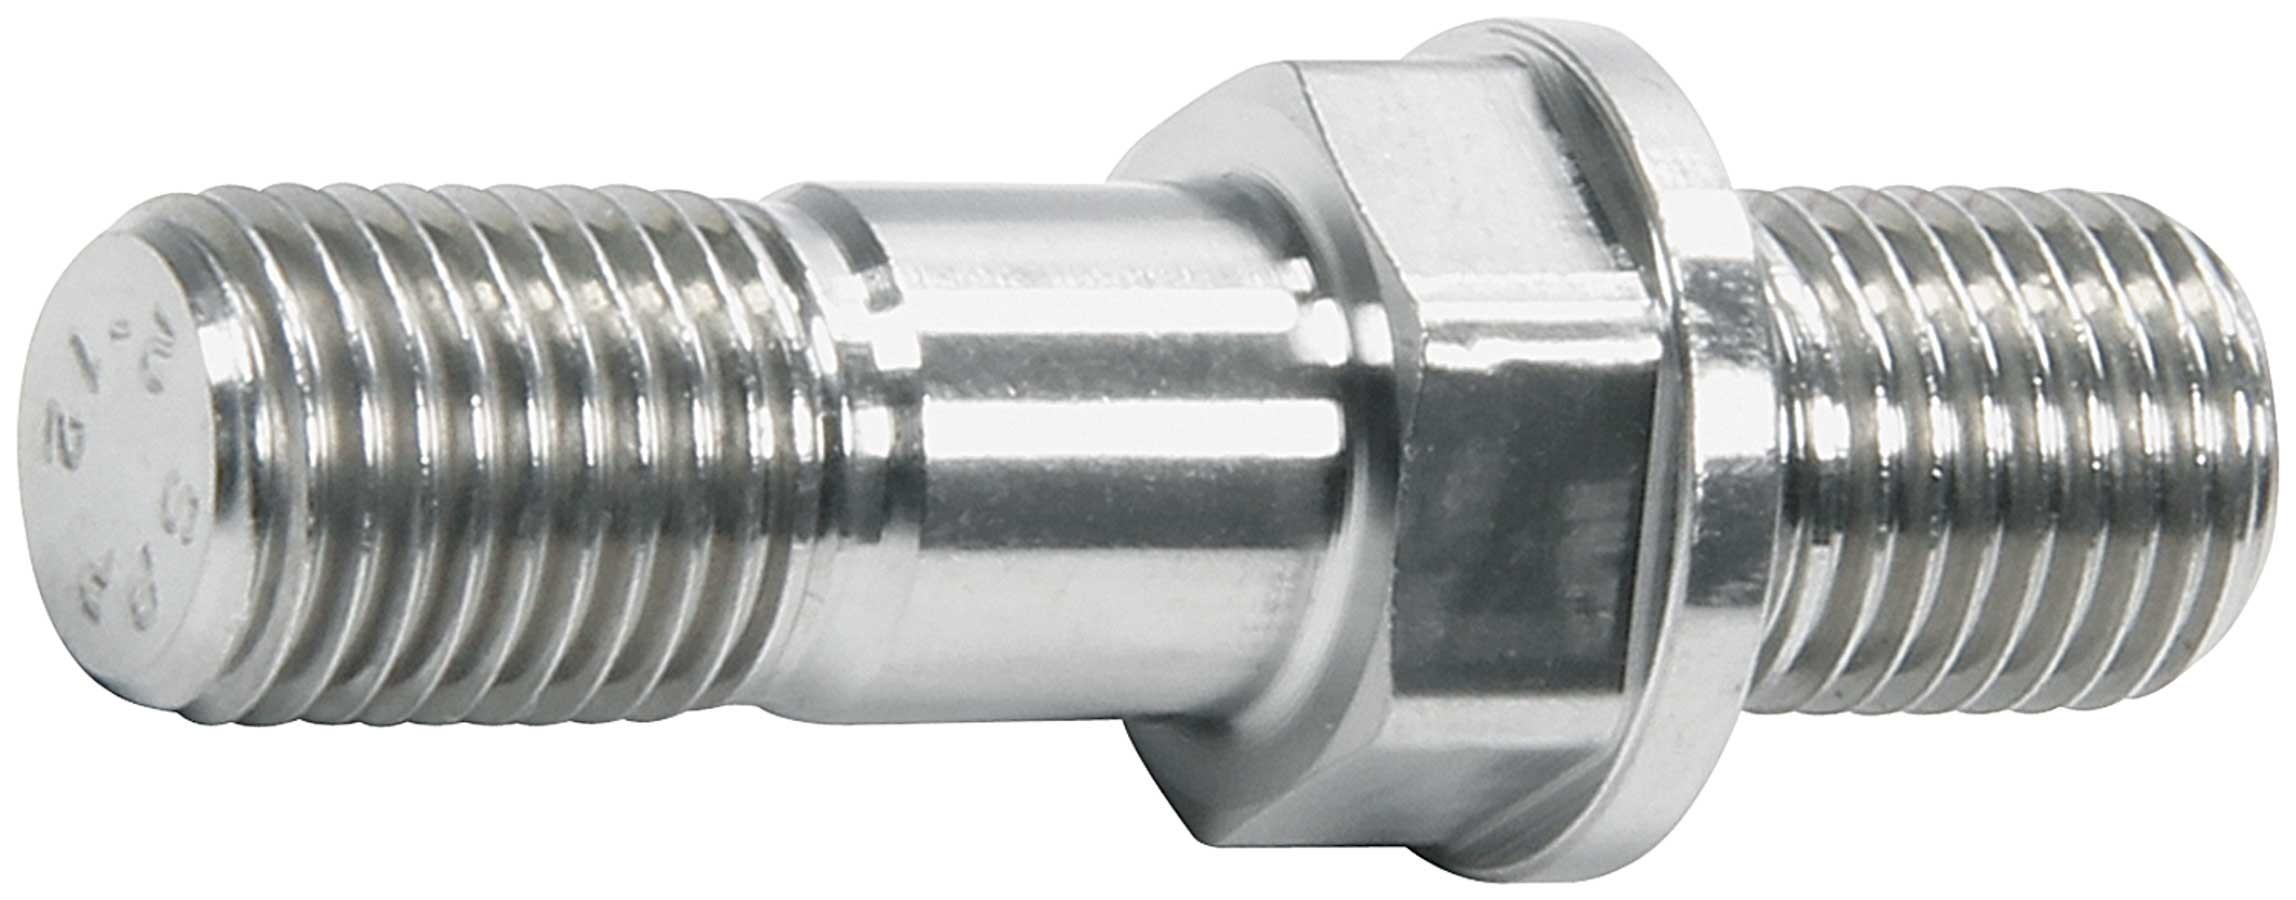 Allstar Performance Wing Cylinder Stud 3/8-24x3/8-24x1.600in